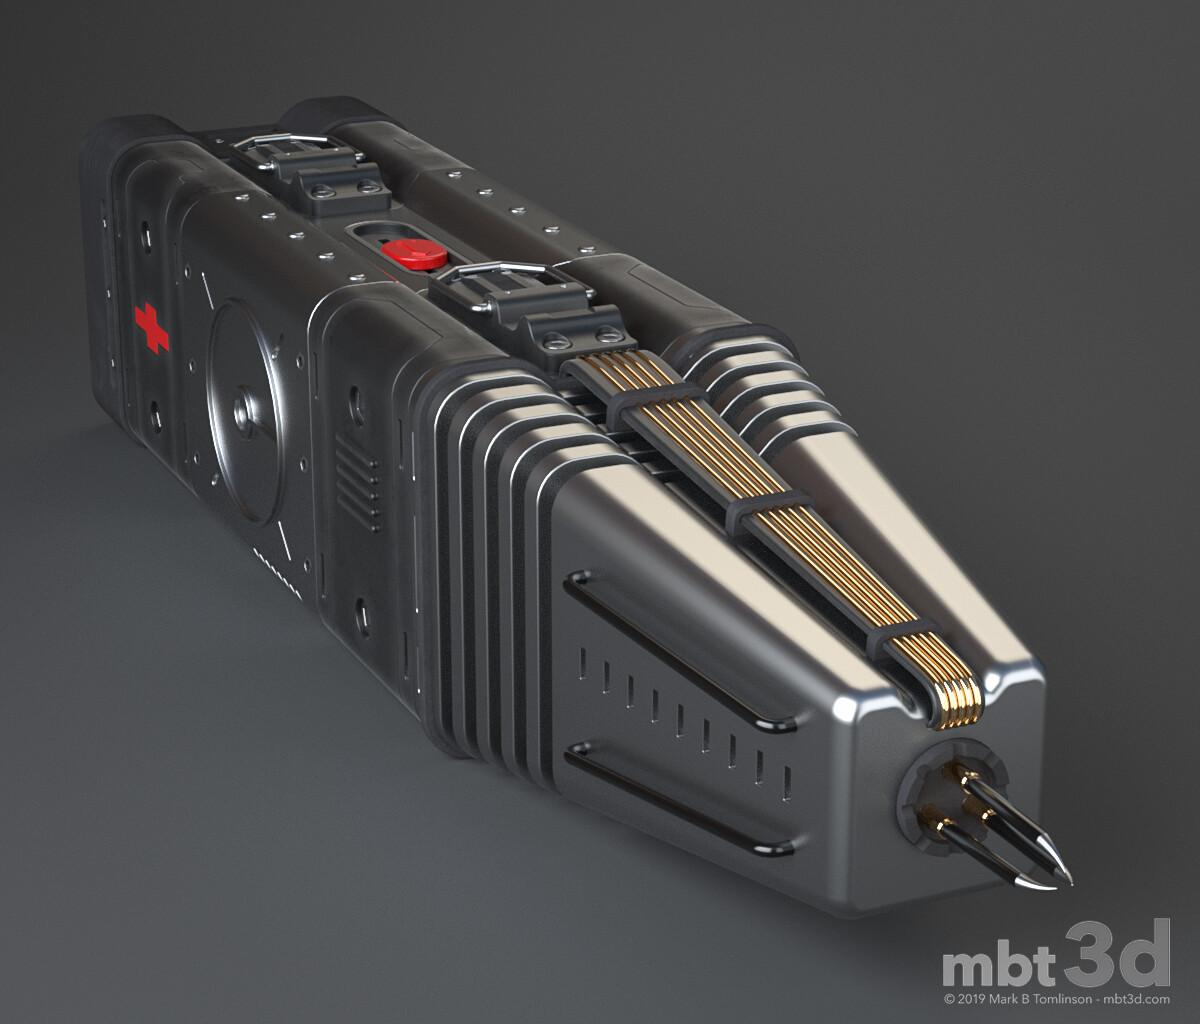 Mark b tomlinson module two 05